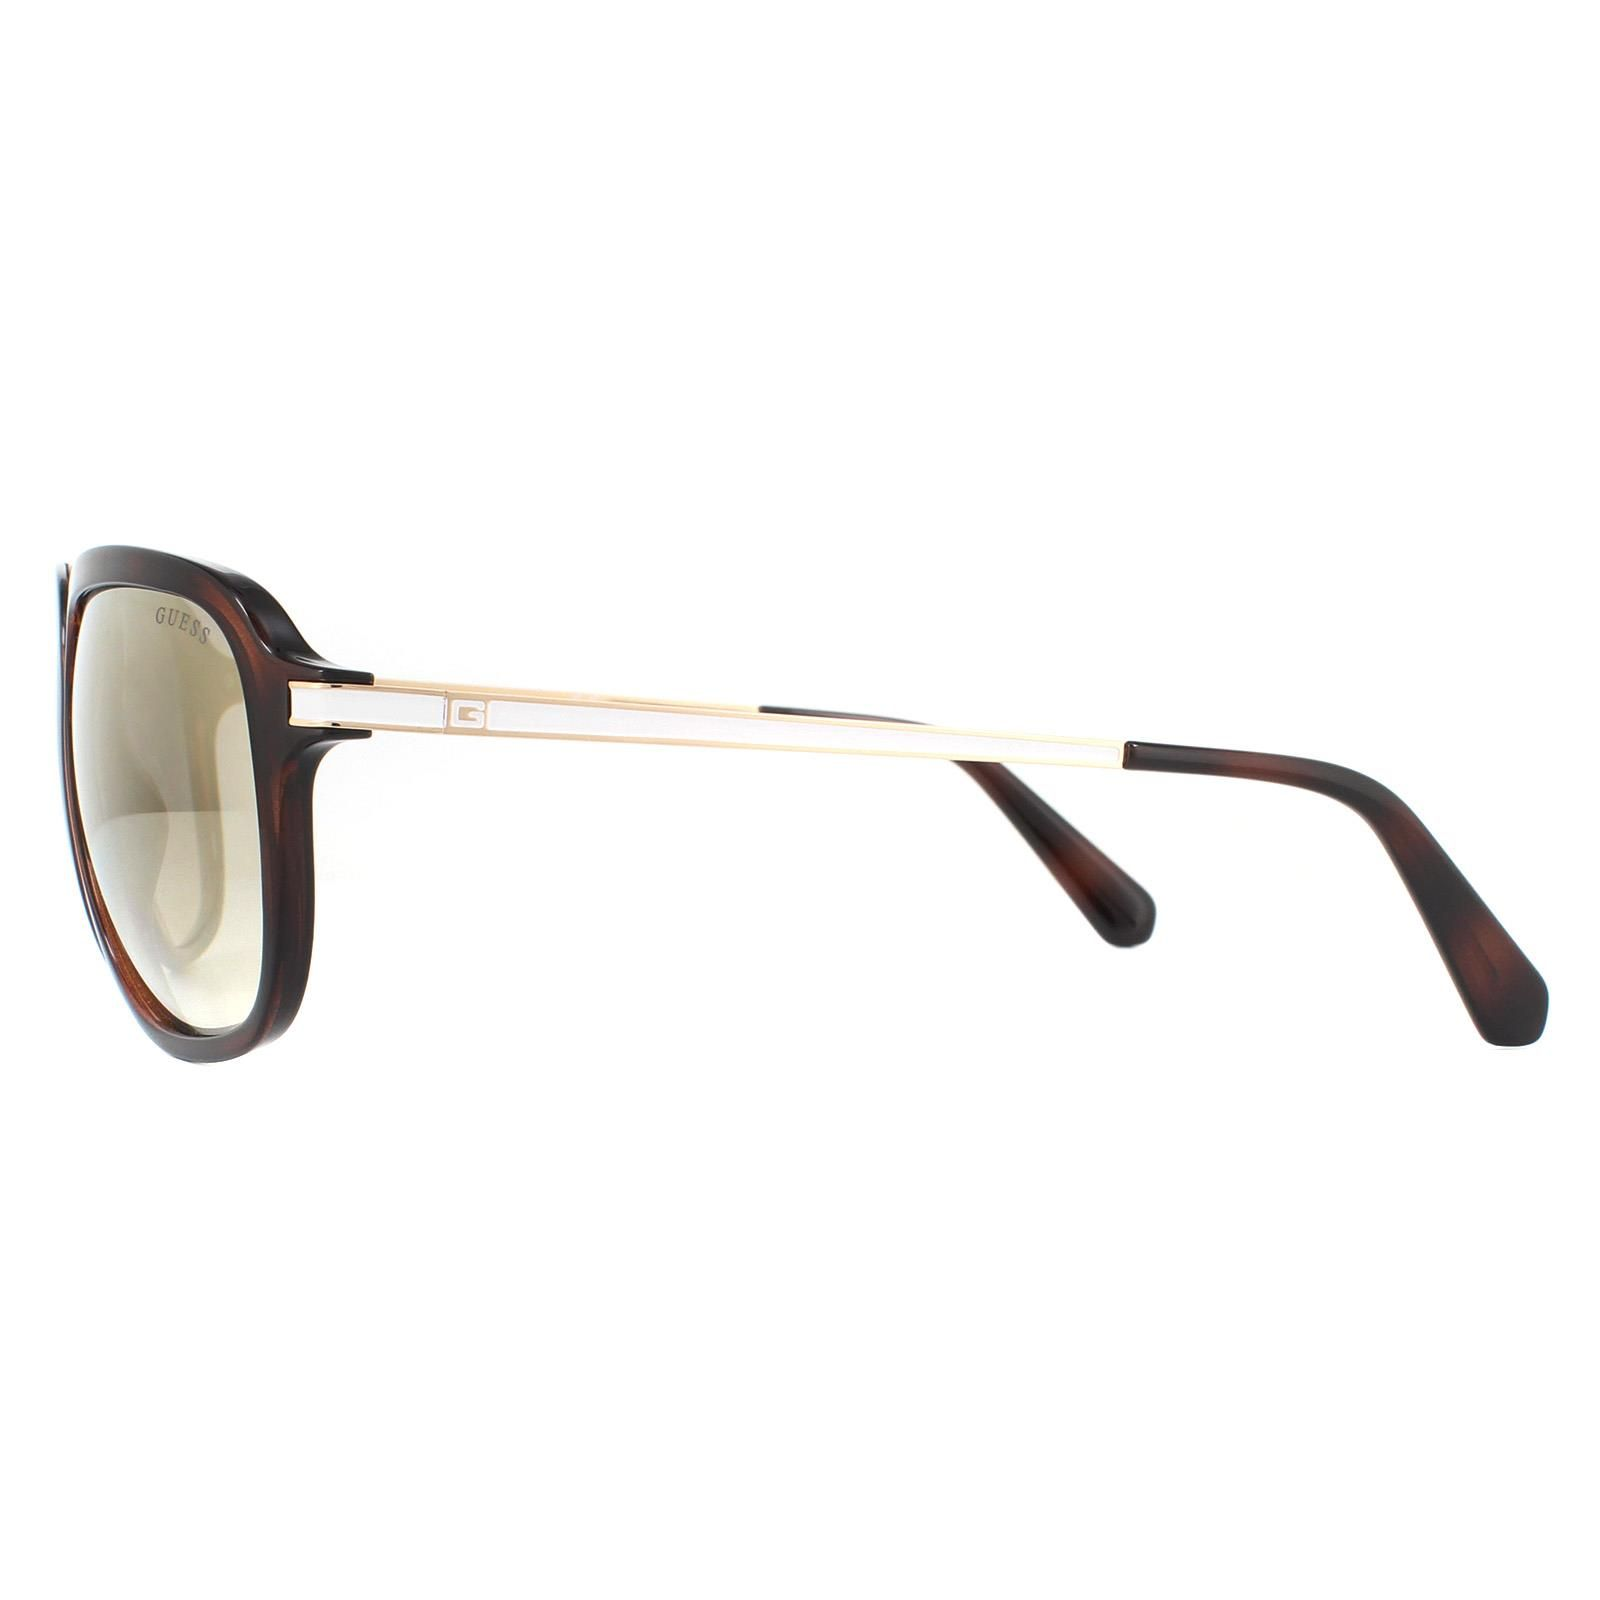 Guess Sunglasses GU6965 52C Dark Havana Pink Mirror